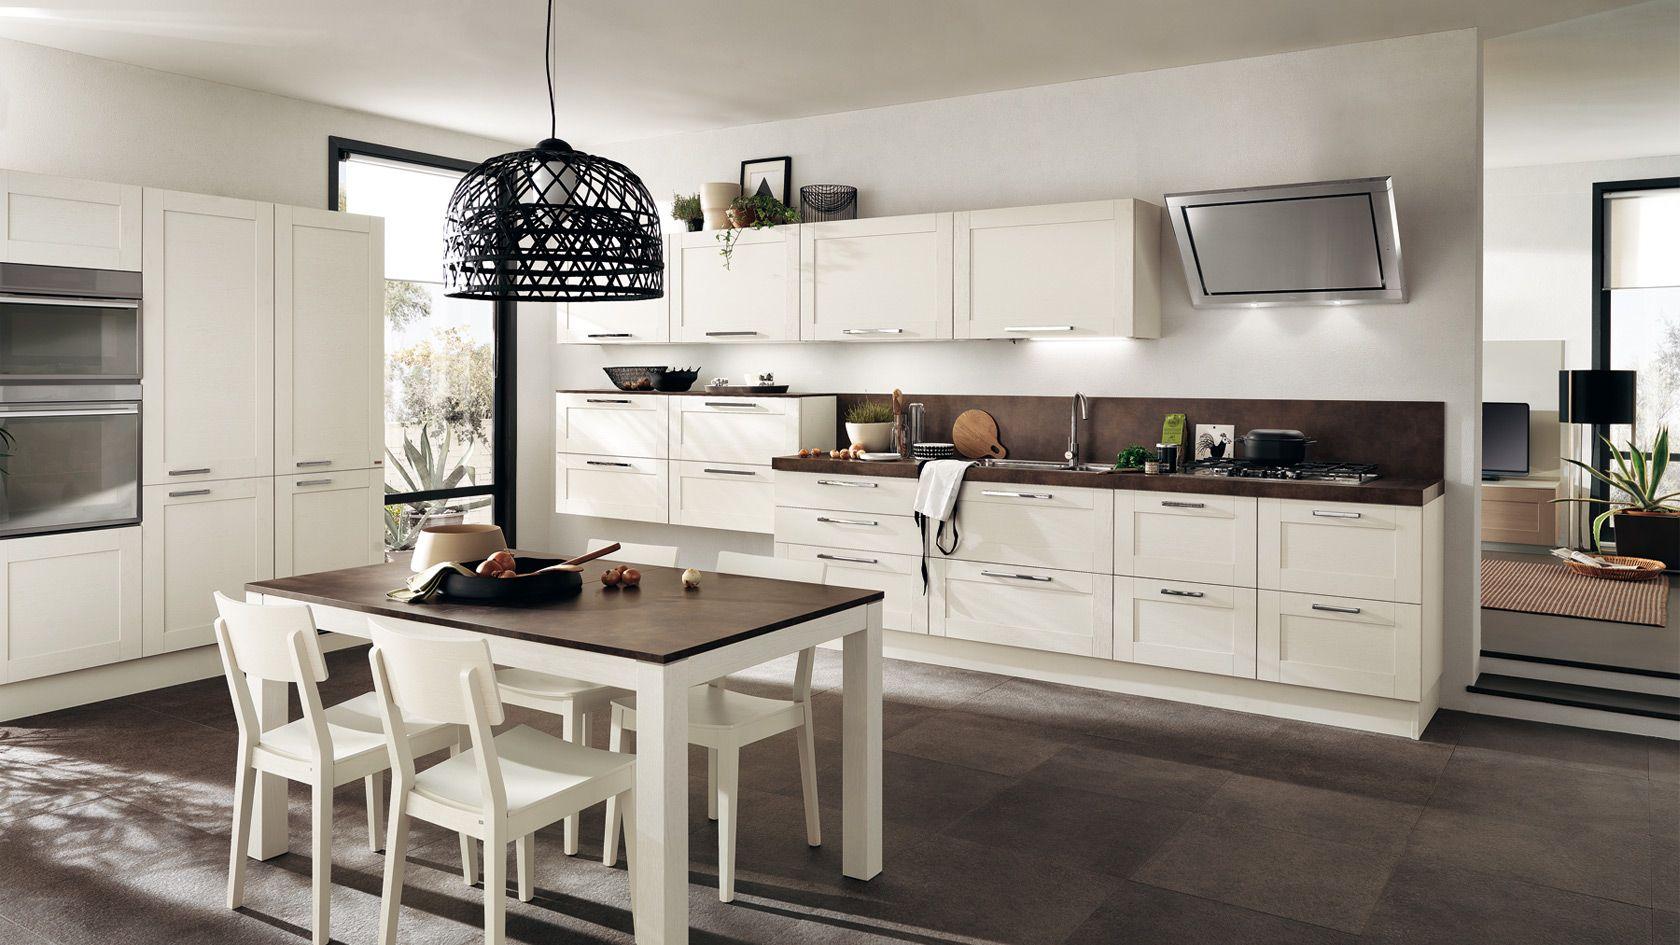 Illuminazione cucina moderna faretto a led da incasso ghost big